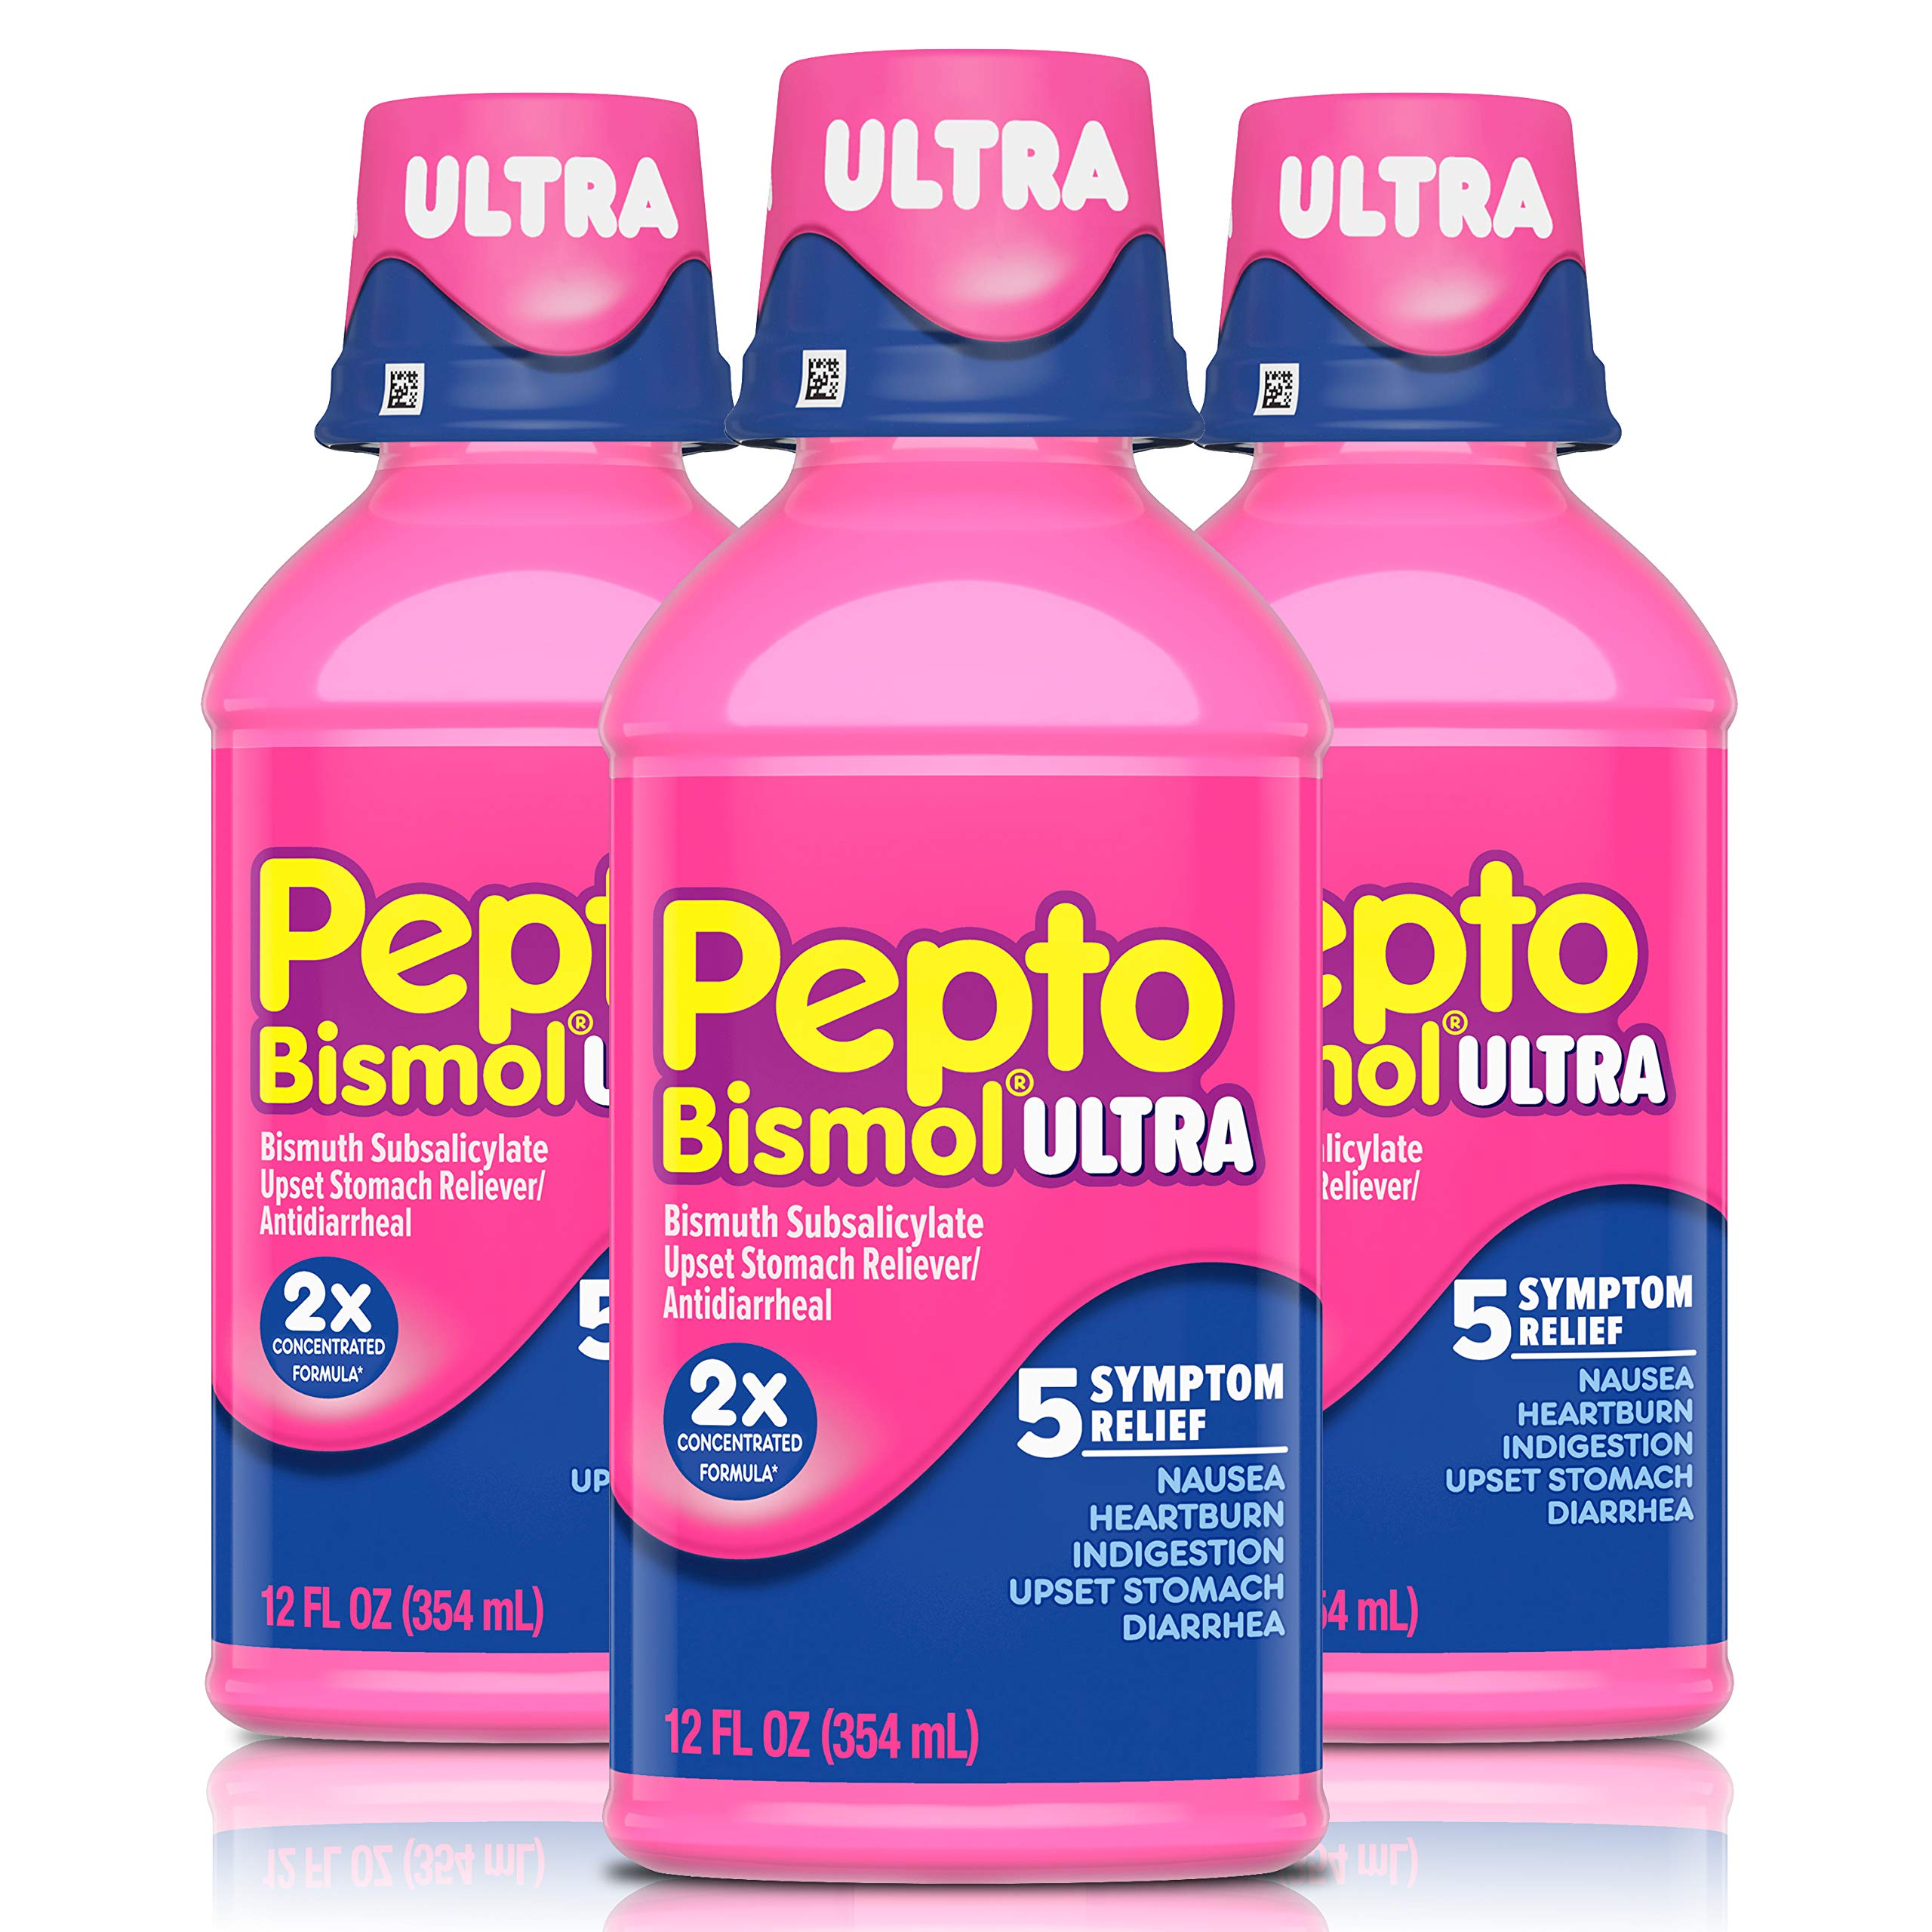 Pepto Bismol Liquid Ultra, Cherry Flavor, 12 fl oz, 3 Pack, Nausea, Heartburn, Indigestion, Upset Stomach, and Diarrhea Relief